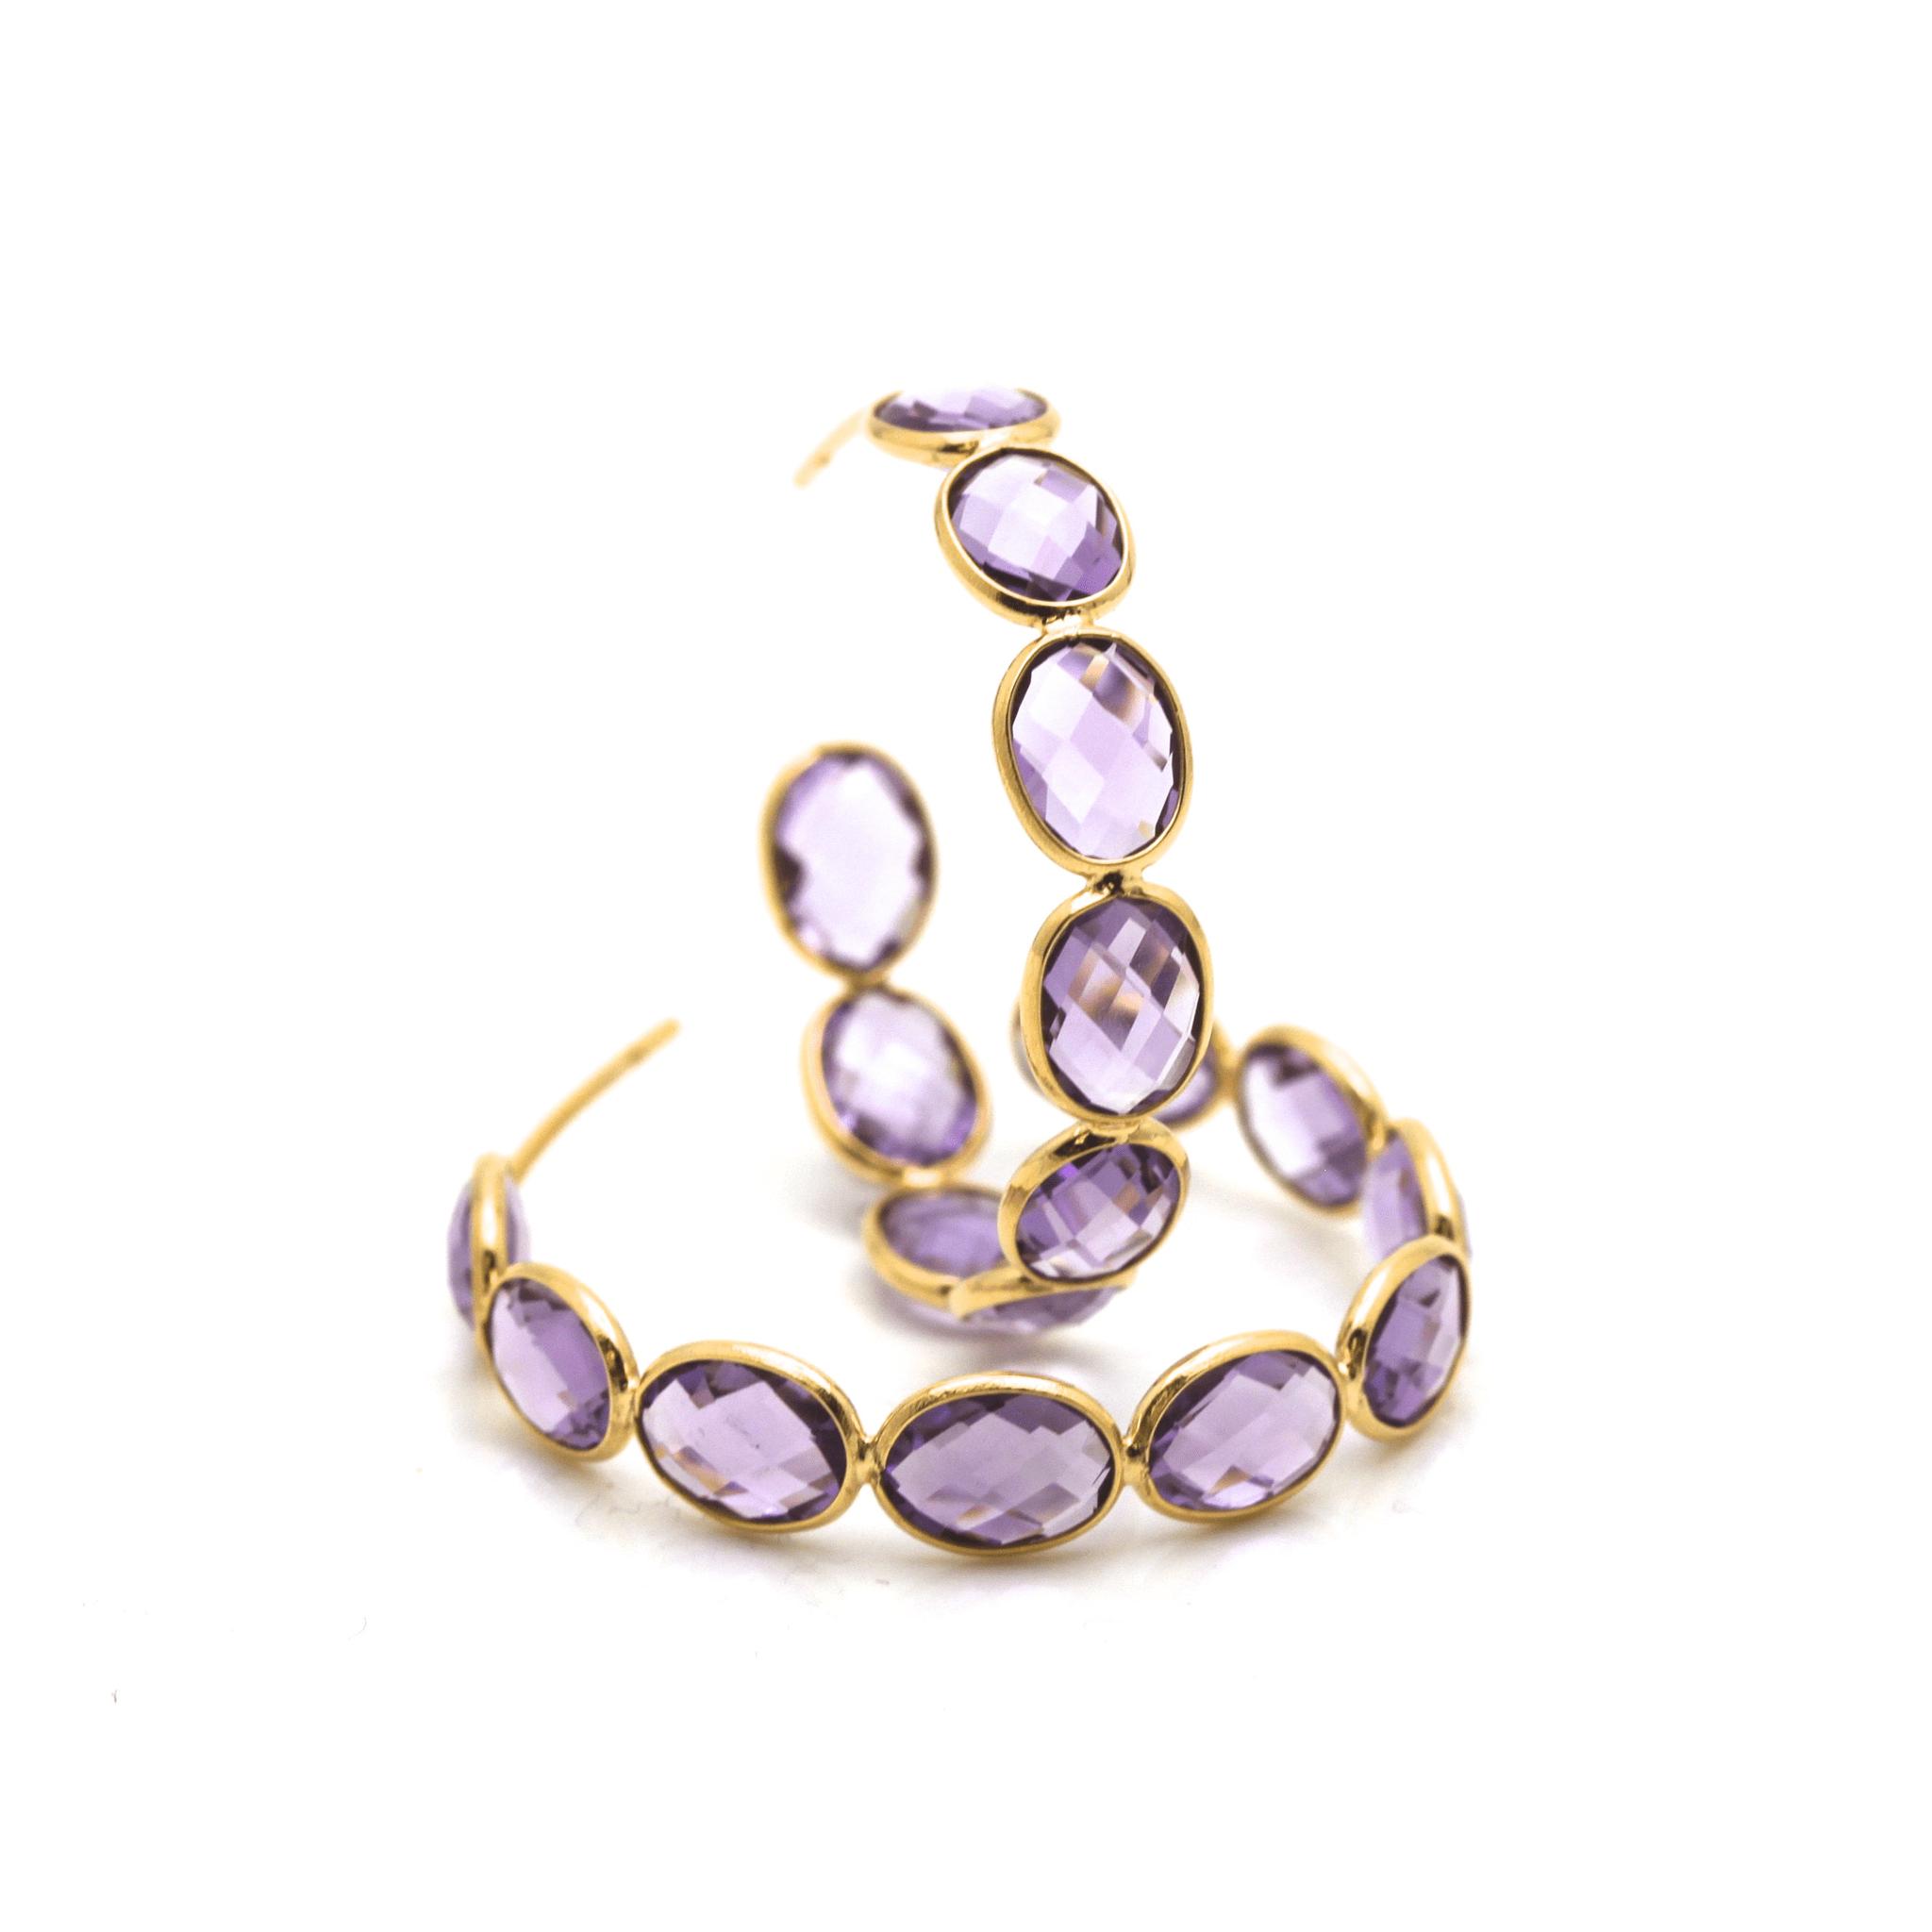 Tresor Collection - Gemstone Medium Hoop Earrings in 18K Yellow Gold